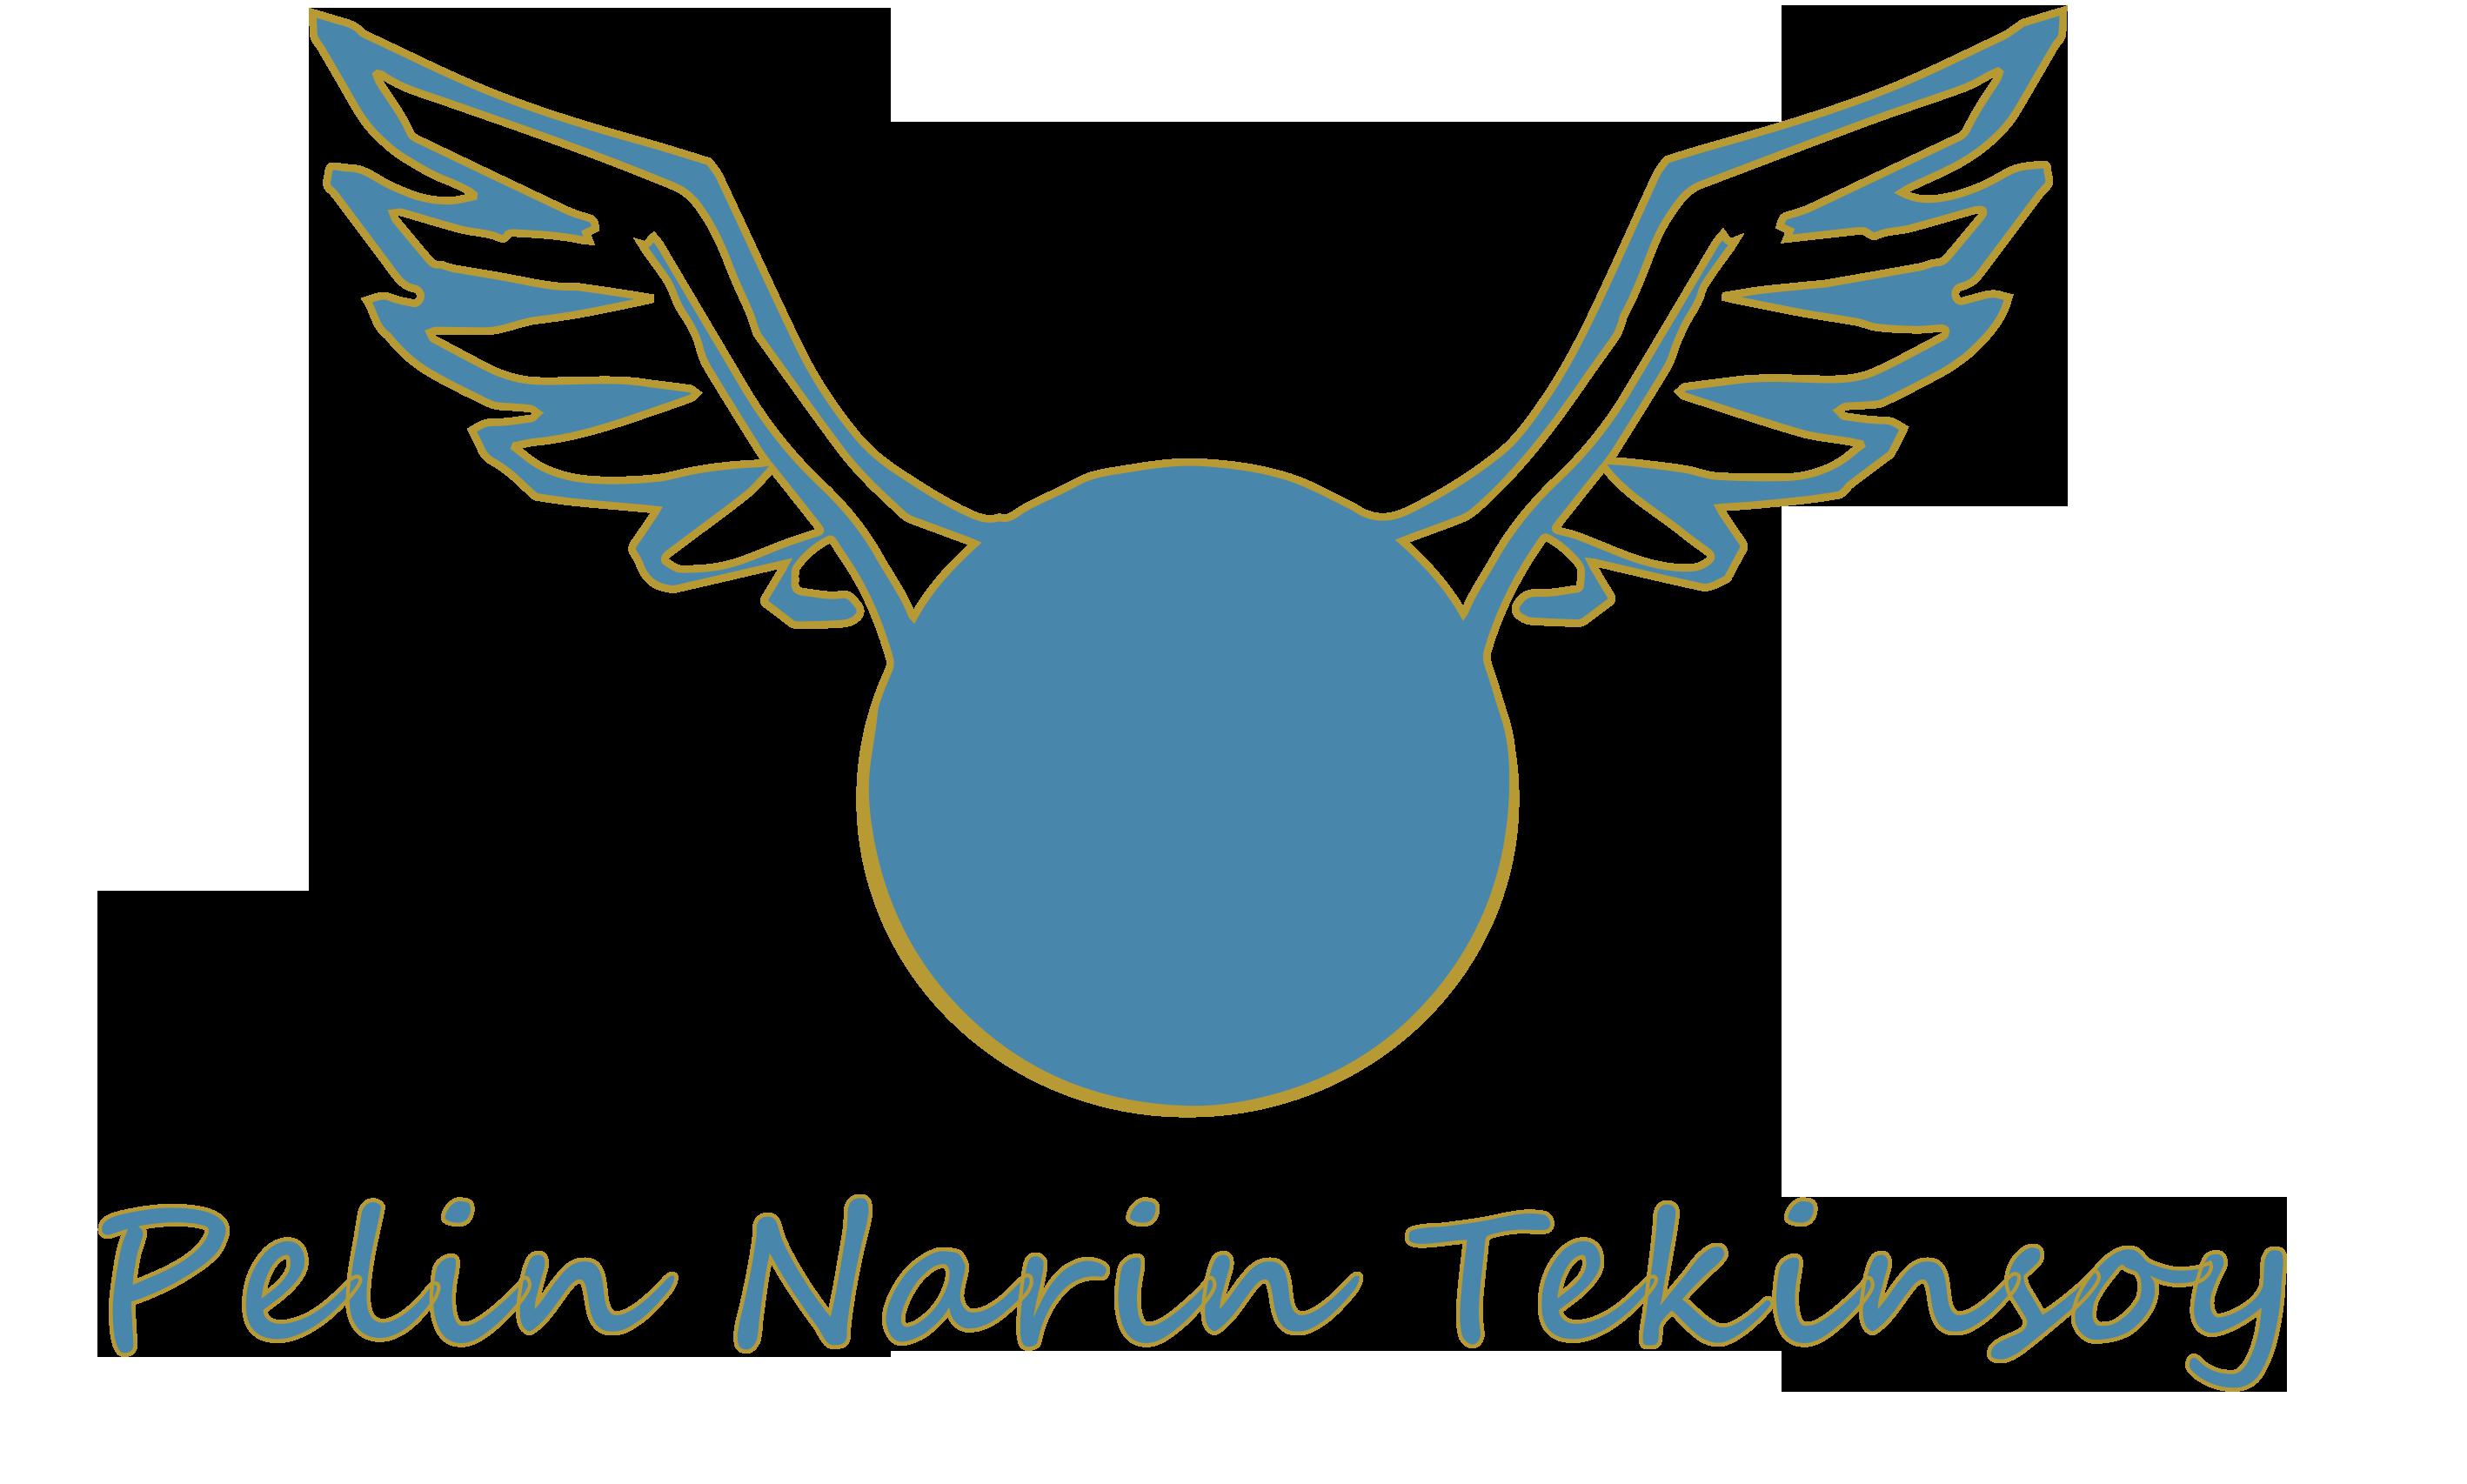 Pelin Narin Tekinsoy